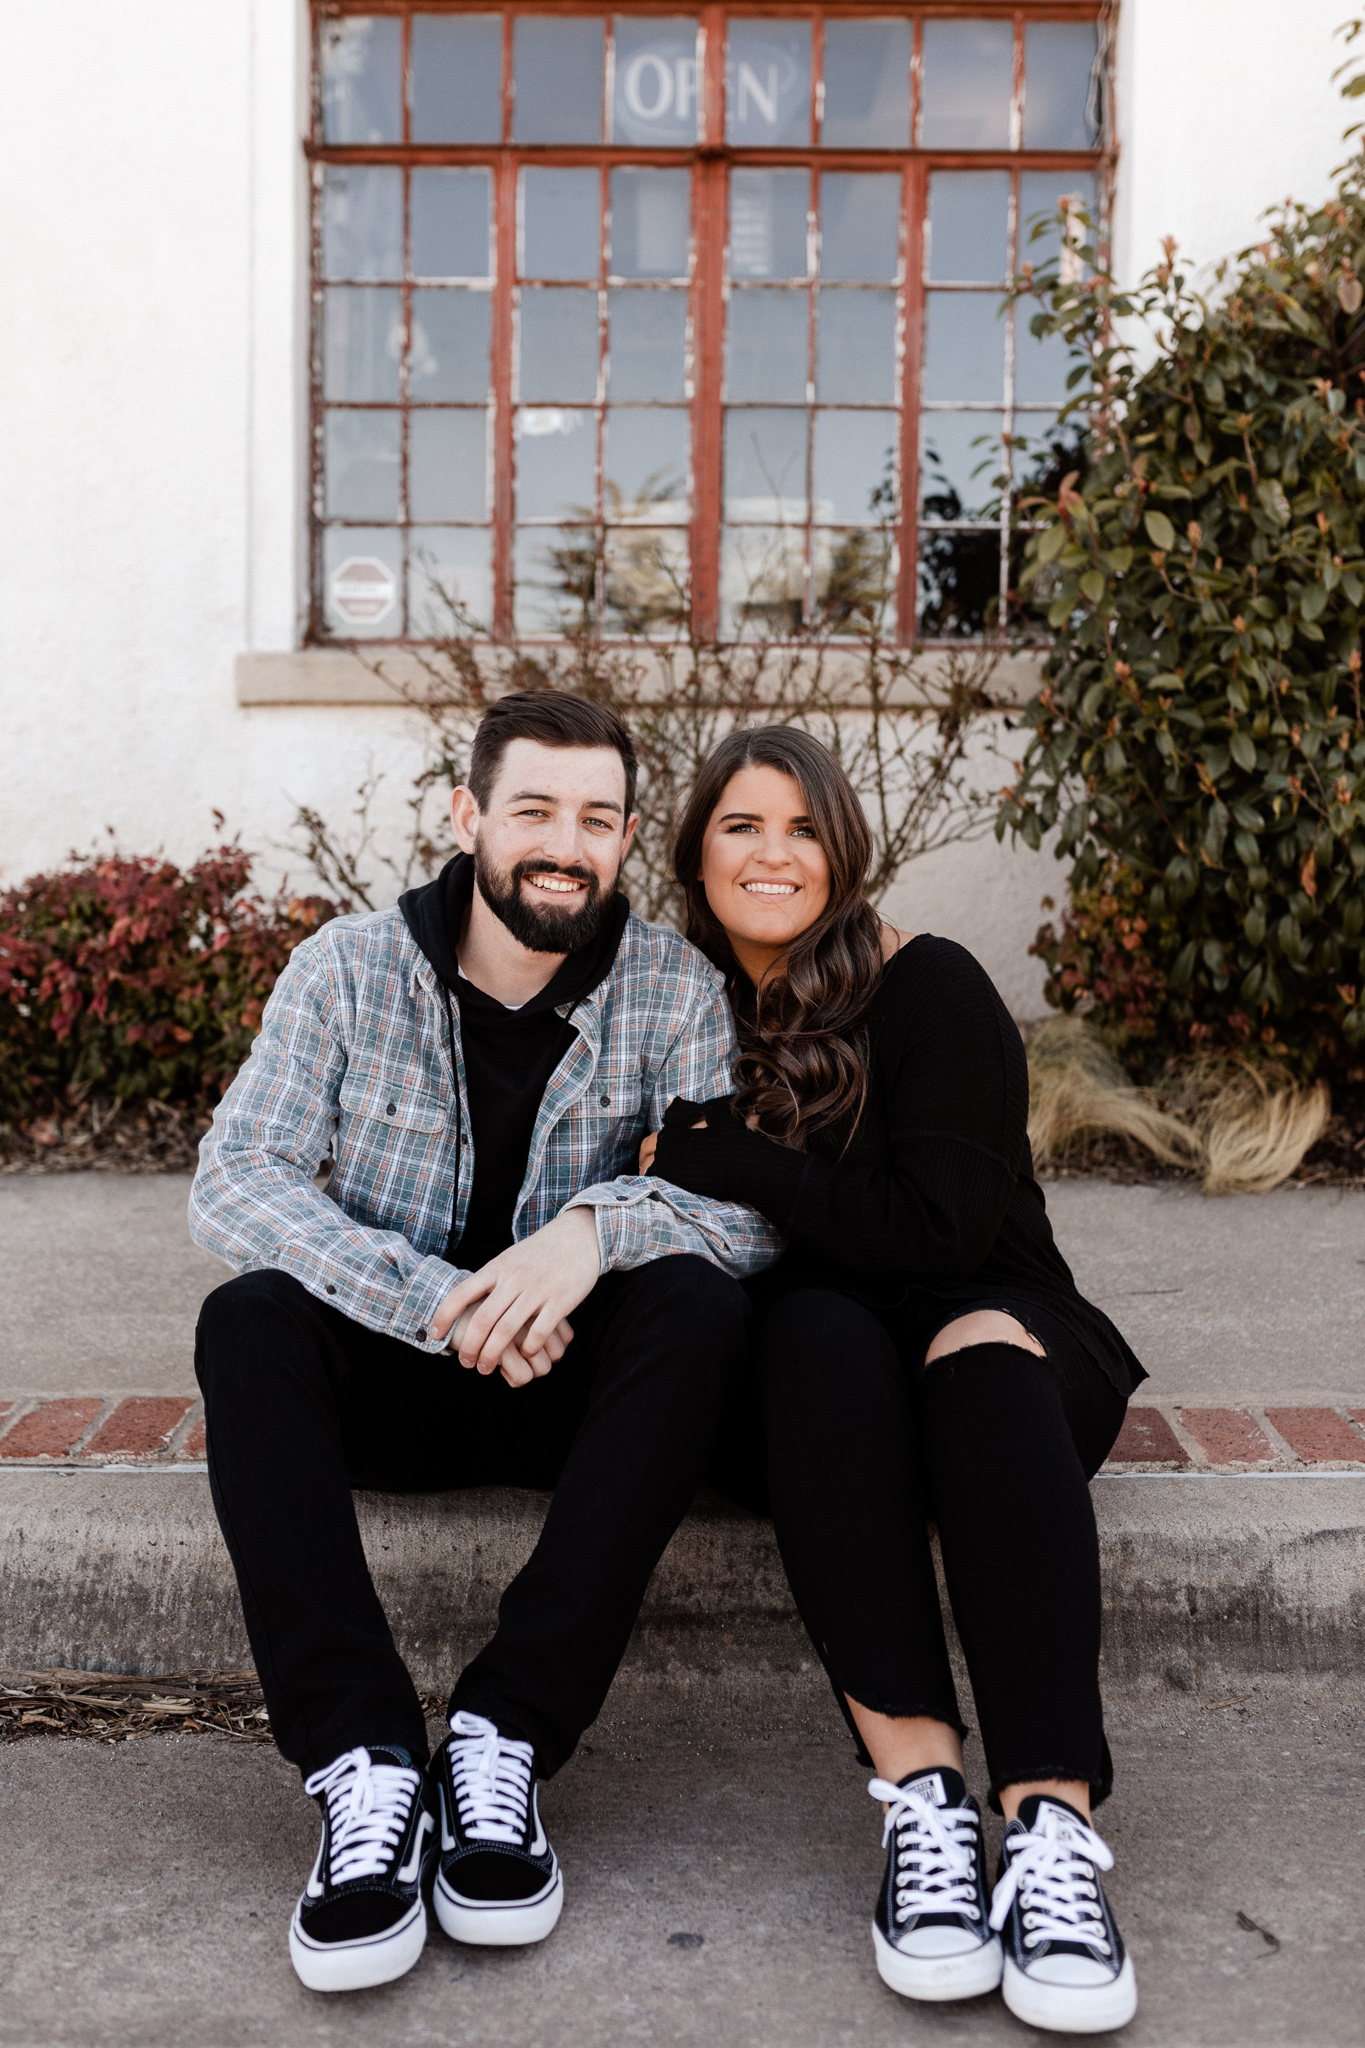 John + Anna | Modern Minimal Engagement Photos | Oklahoma Wedding Photographer-26.jpg